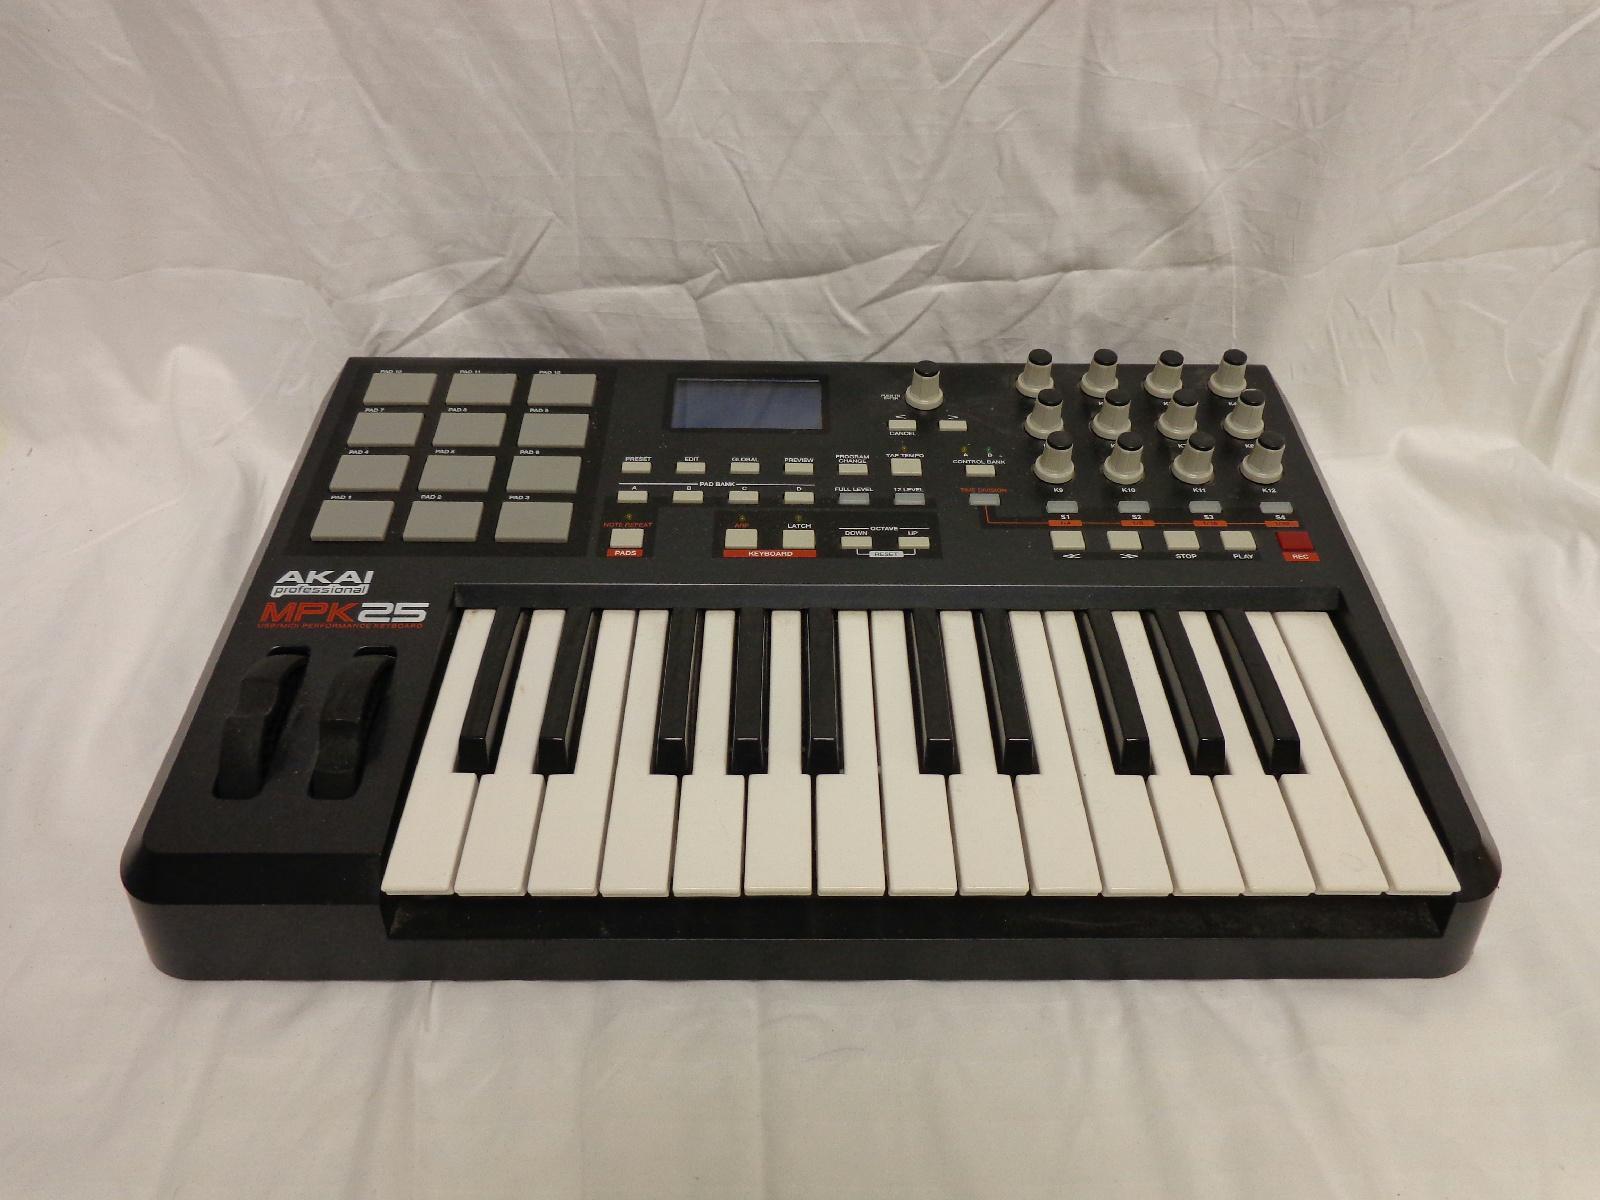 akai professional mpk25 25 key usb midi keyboard controller ebay. Black Bedroom Furniture Sets. Home Design Ideas